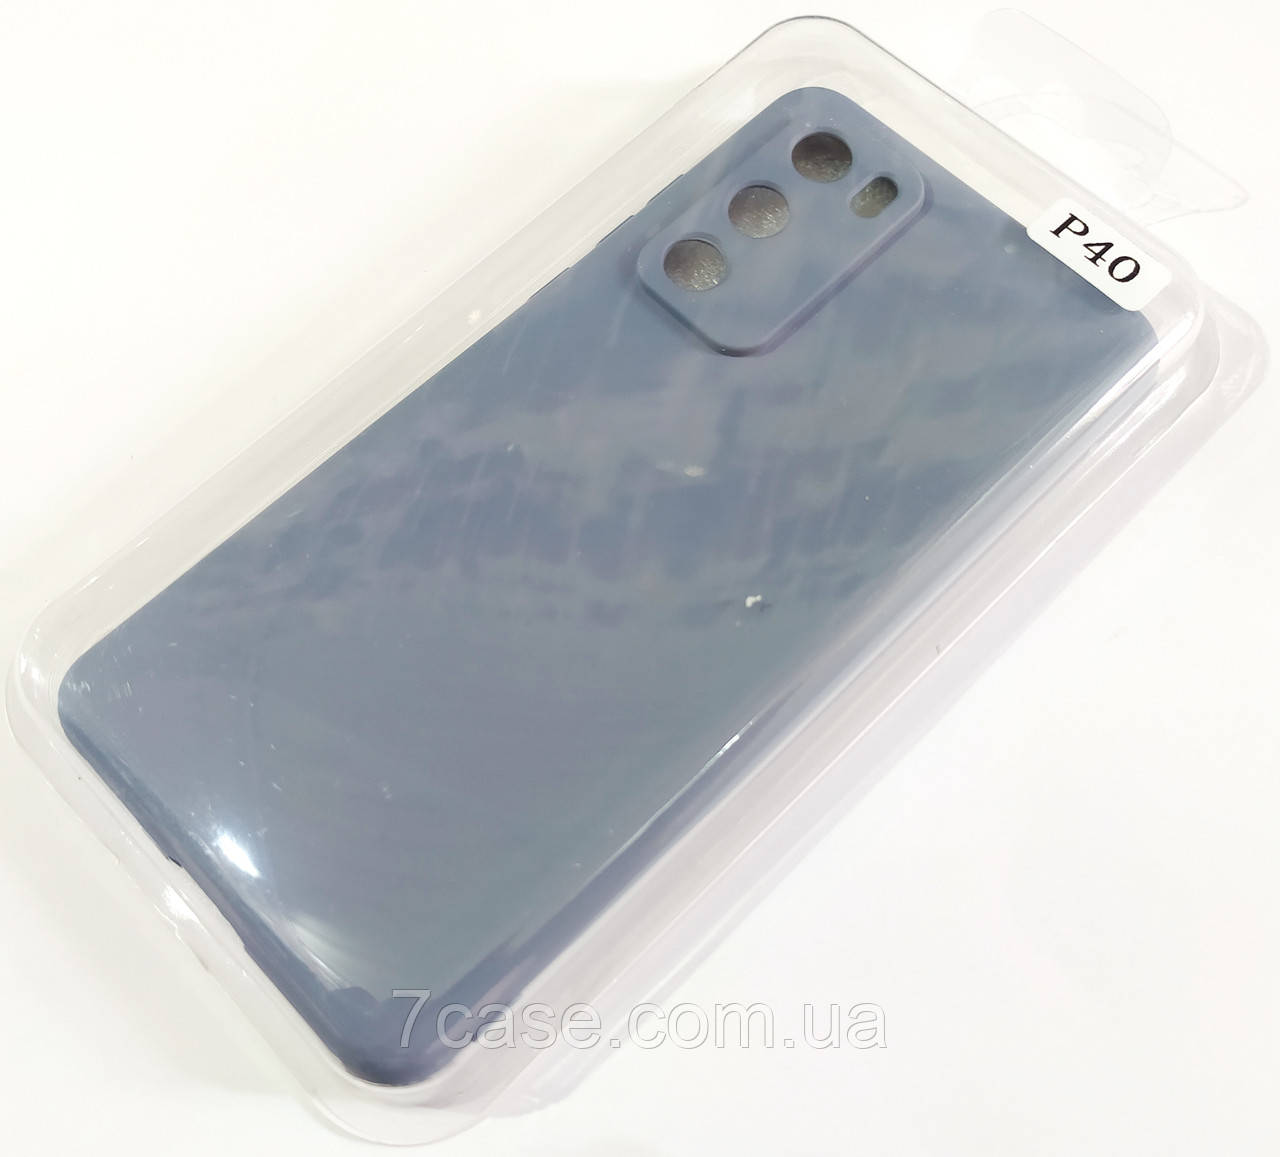 Чехол для Huawei P40 матовый Silicone Case Full Cover Macarons Color